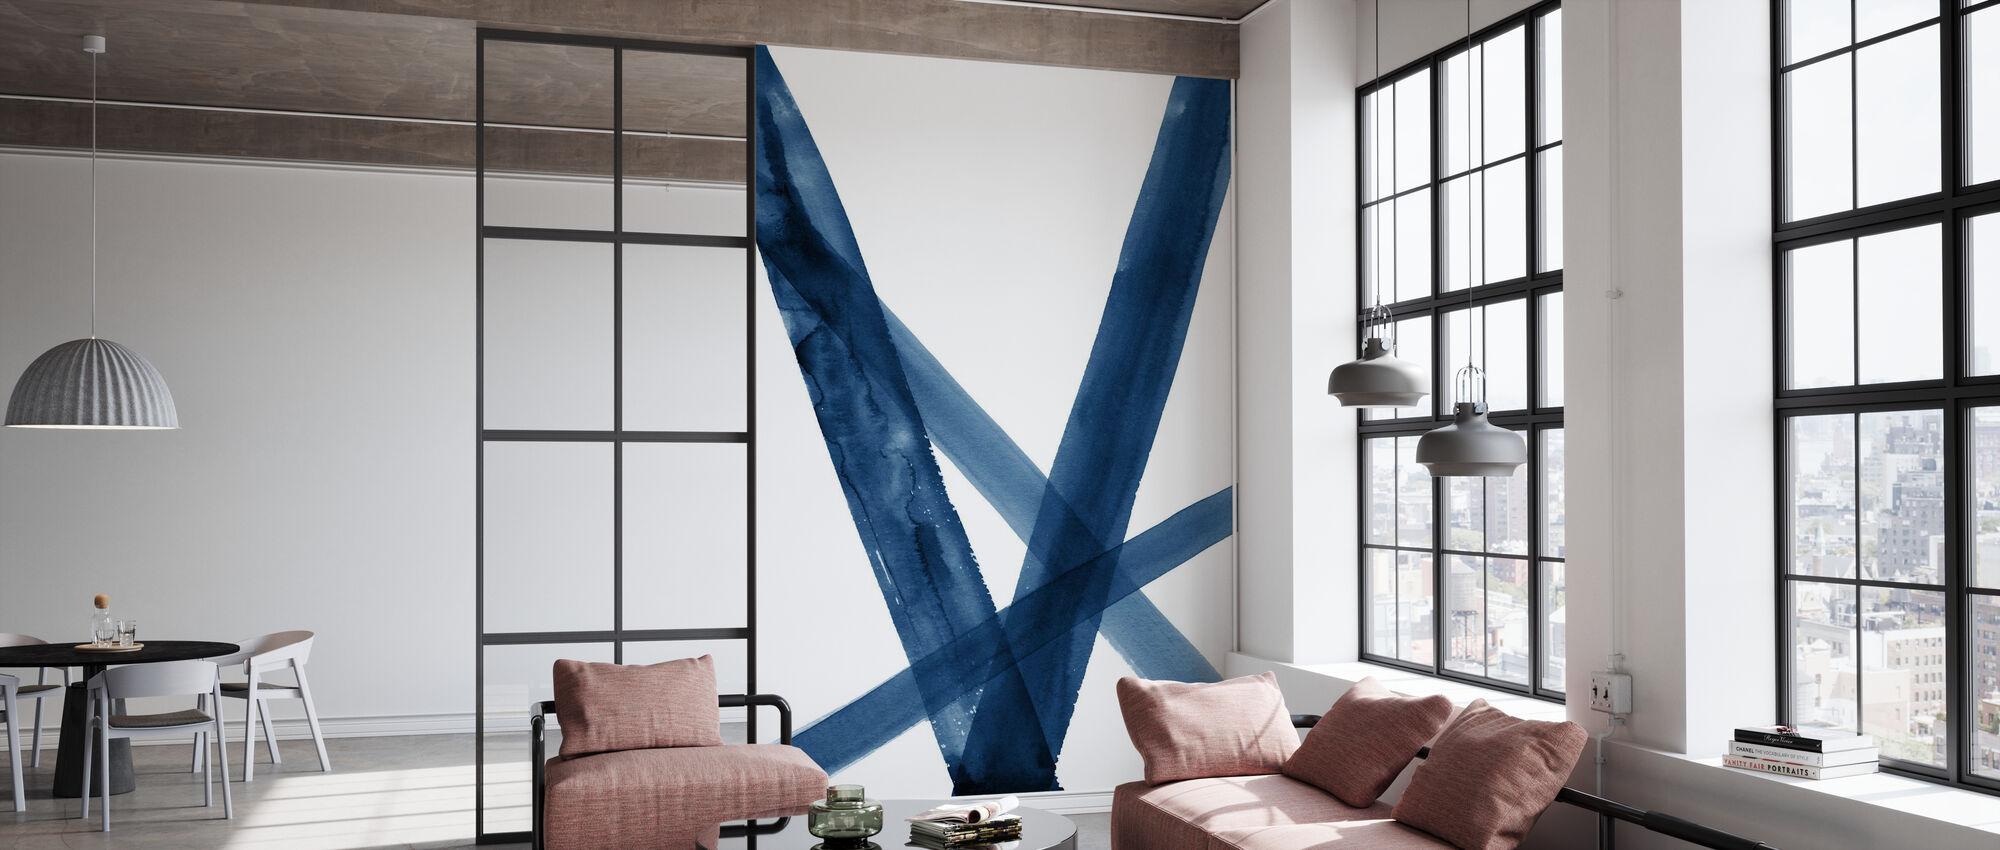 Akvarelinjer II Blå - Tapet - Kontor